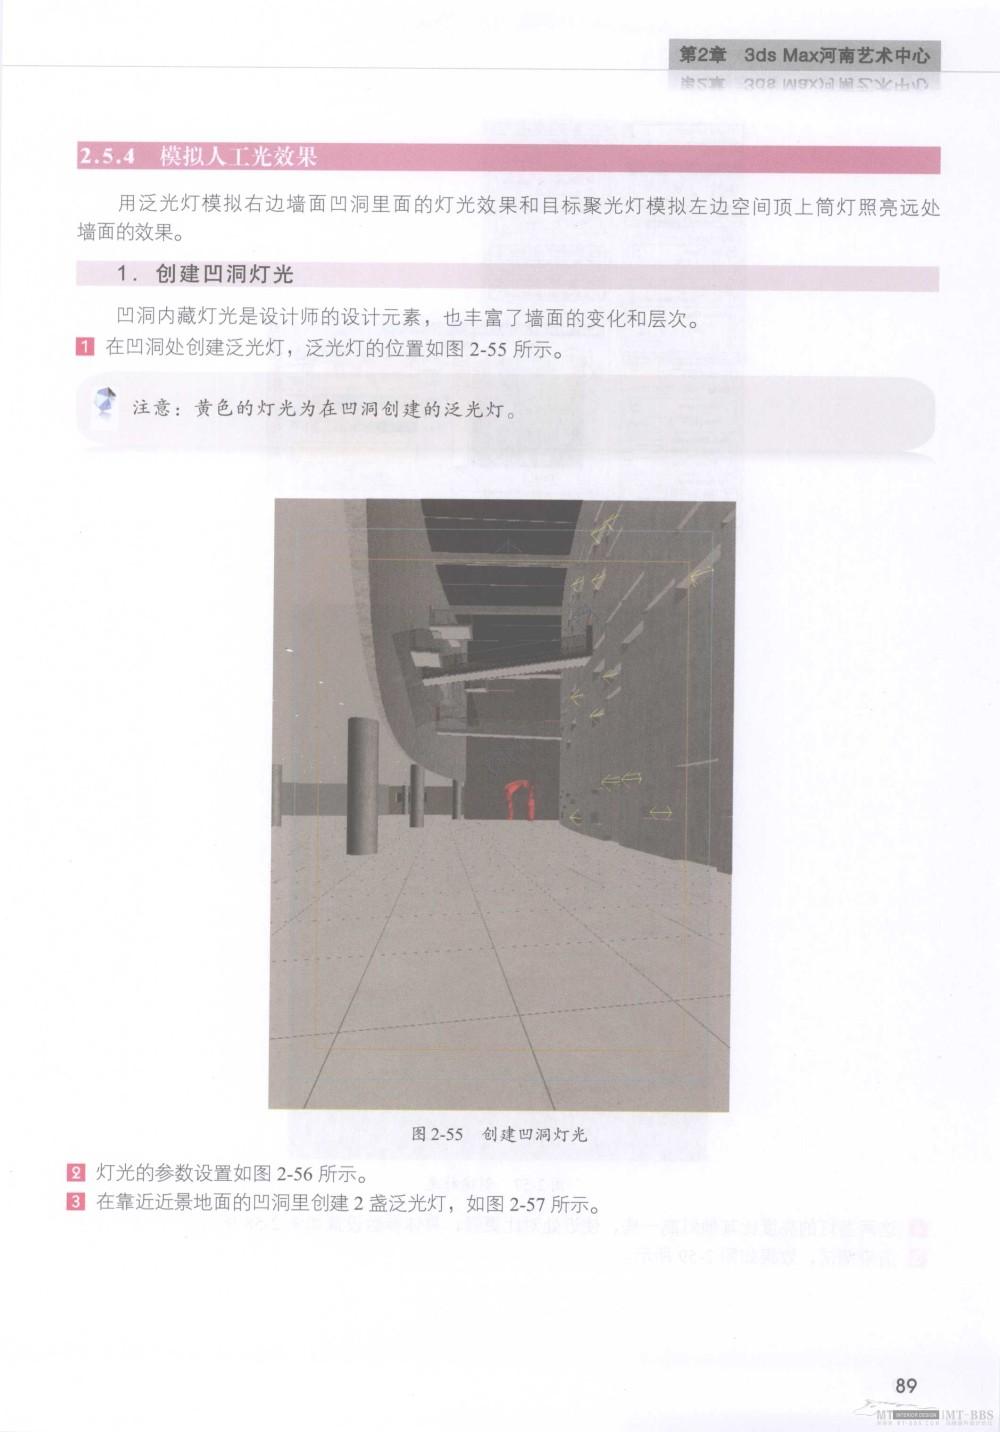 水晶石技法-3ds_Max&VRay室内空间表现_水晶石技法-3ds_Max&VRay室内空间表现_页面_095.jpg